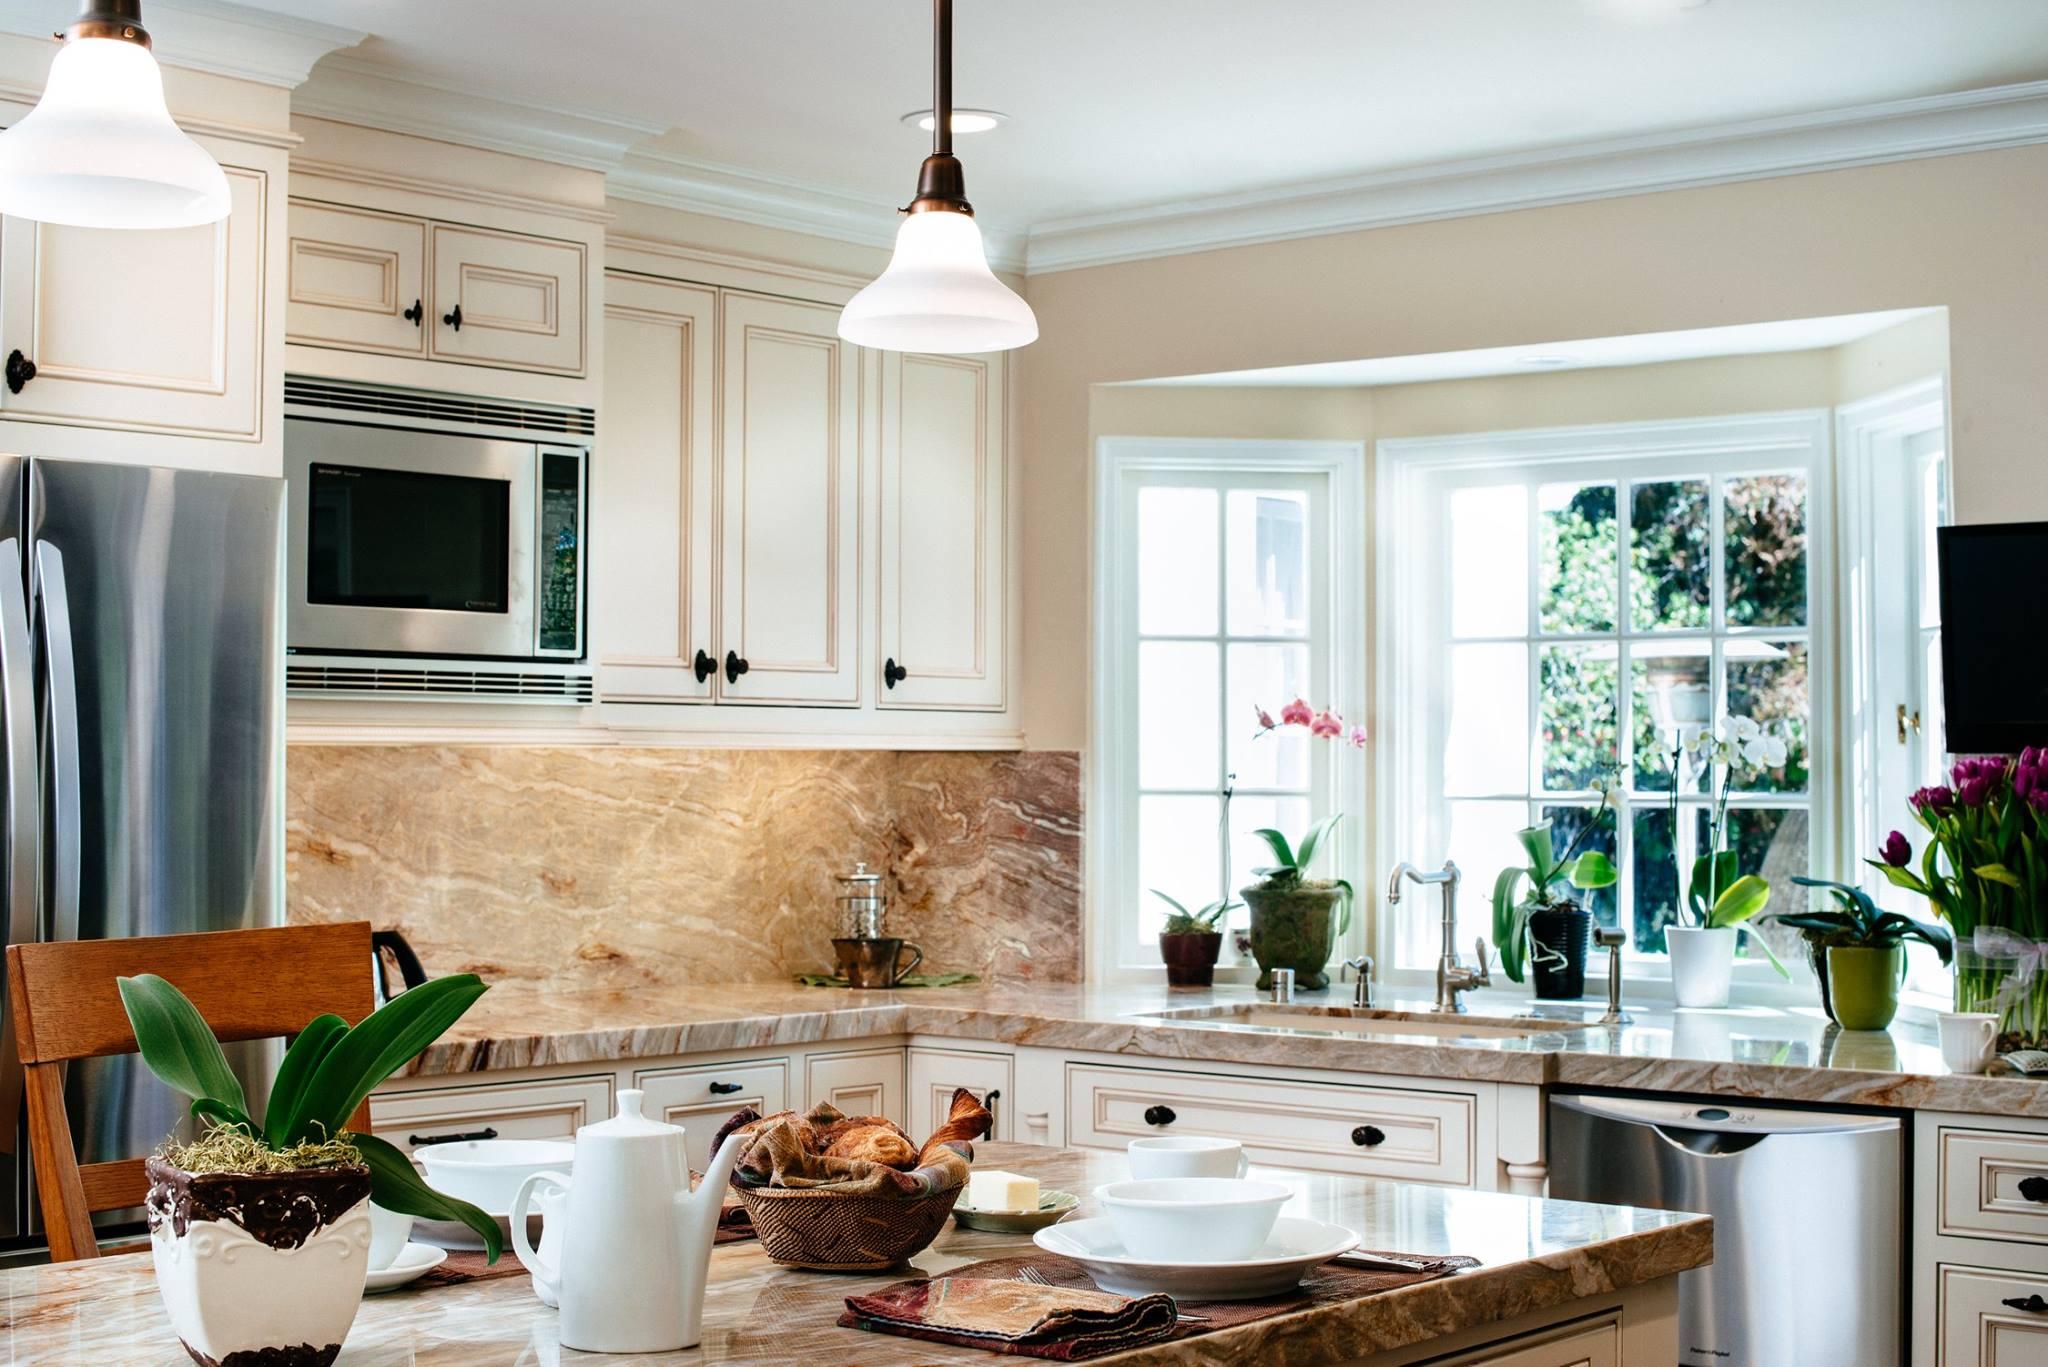 kitchen_remodel4.jpg